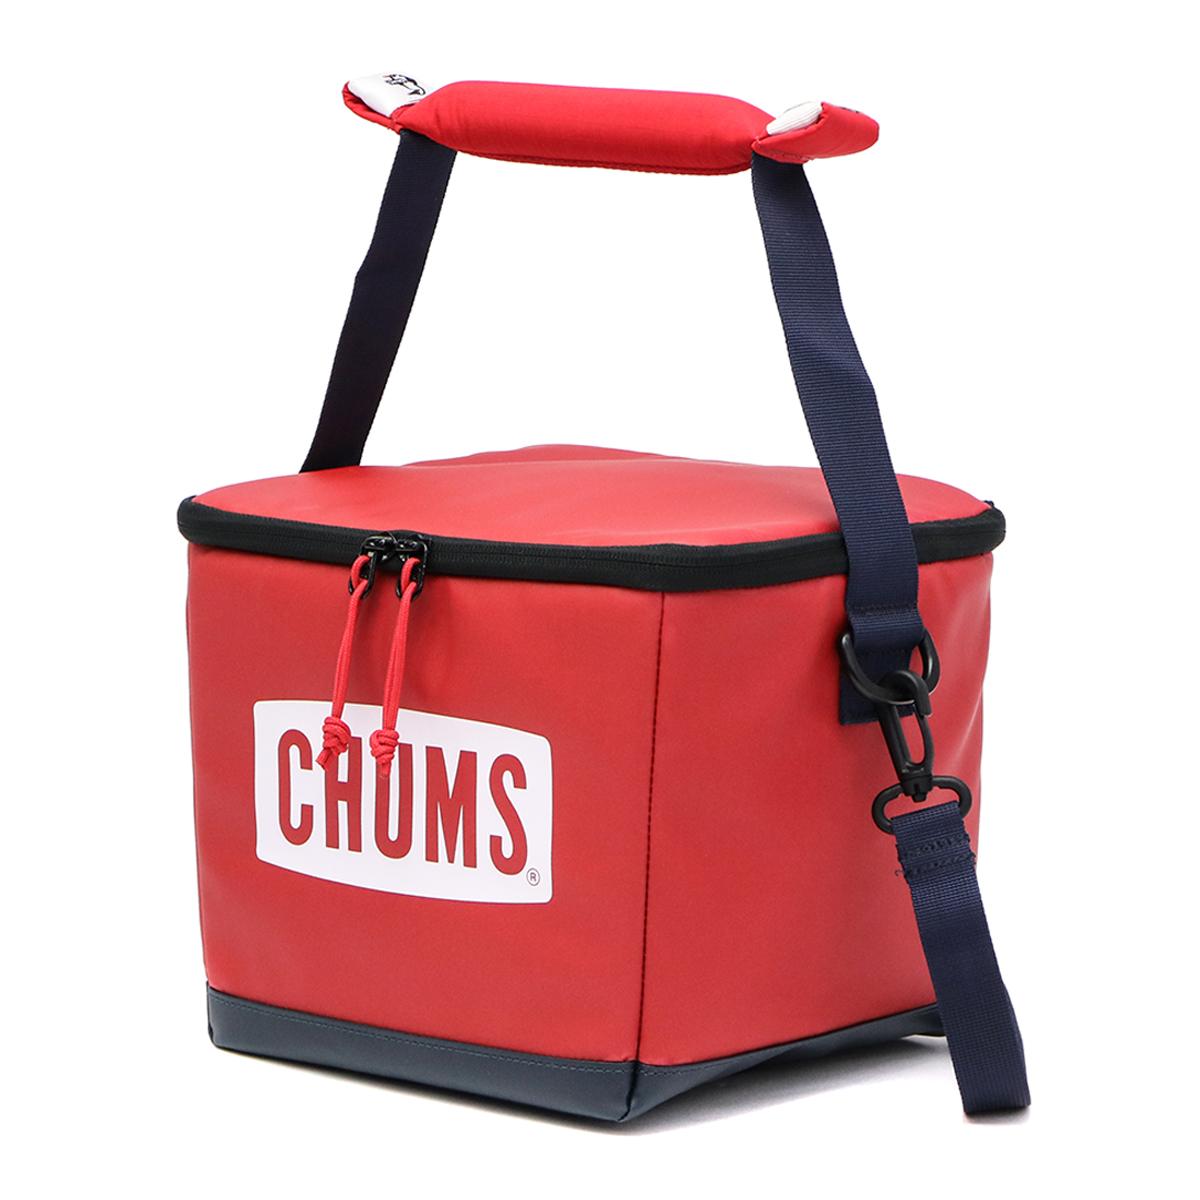 Chums Eddy Lunch Cooler Bag Box Small Shoulder Compact 6l Men S Las Ch60 2368